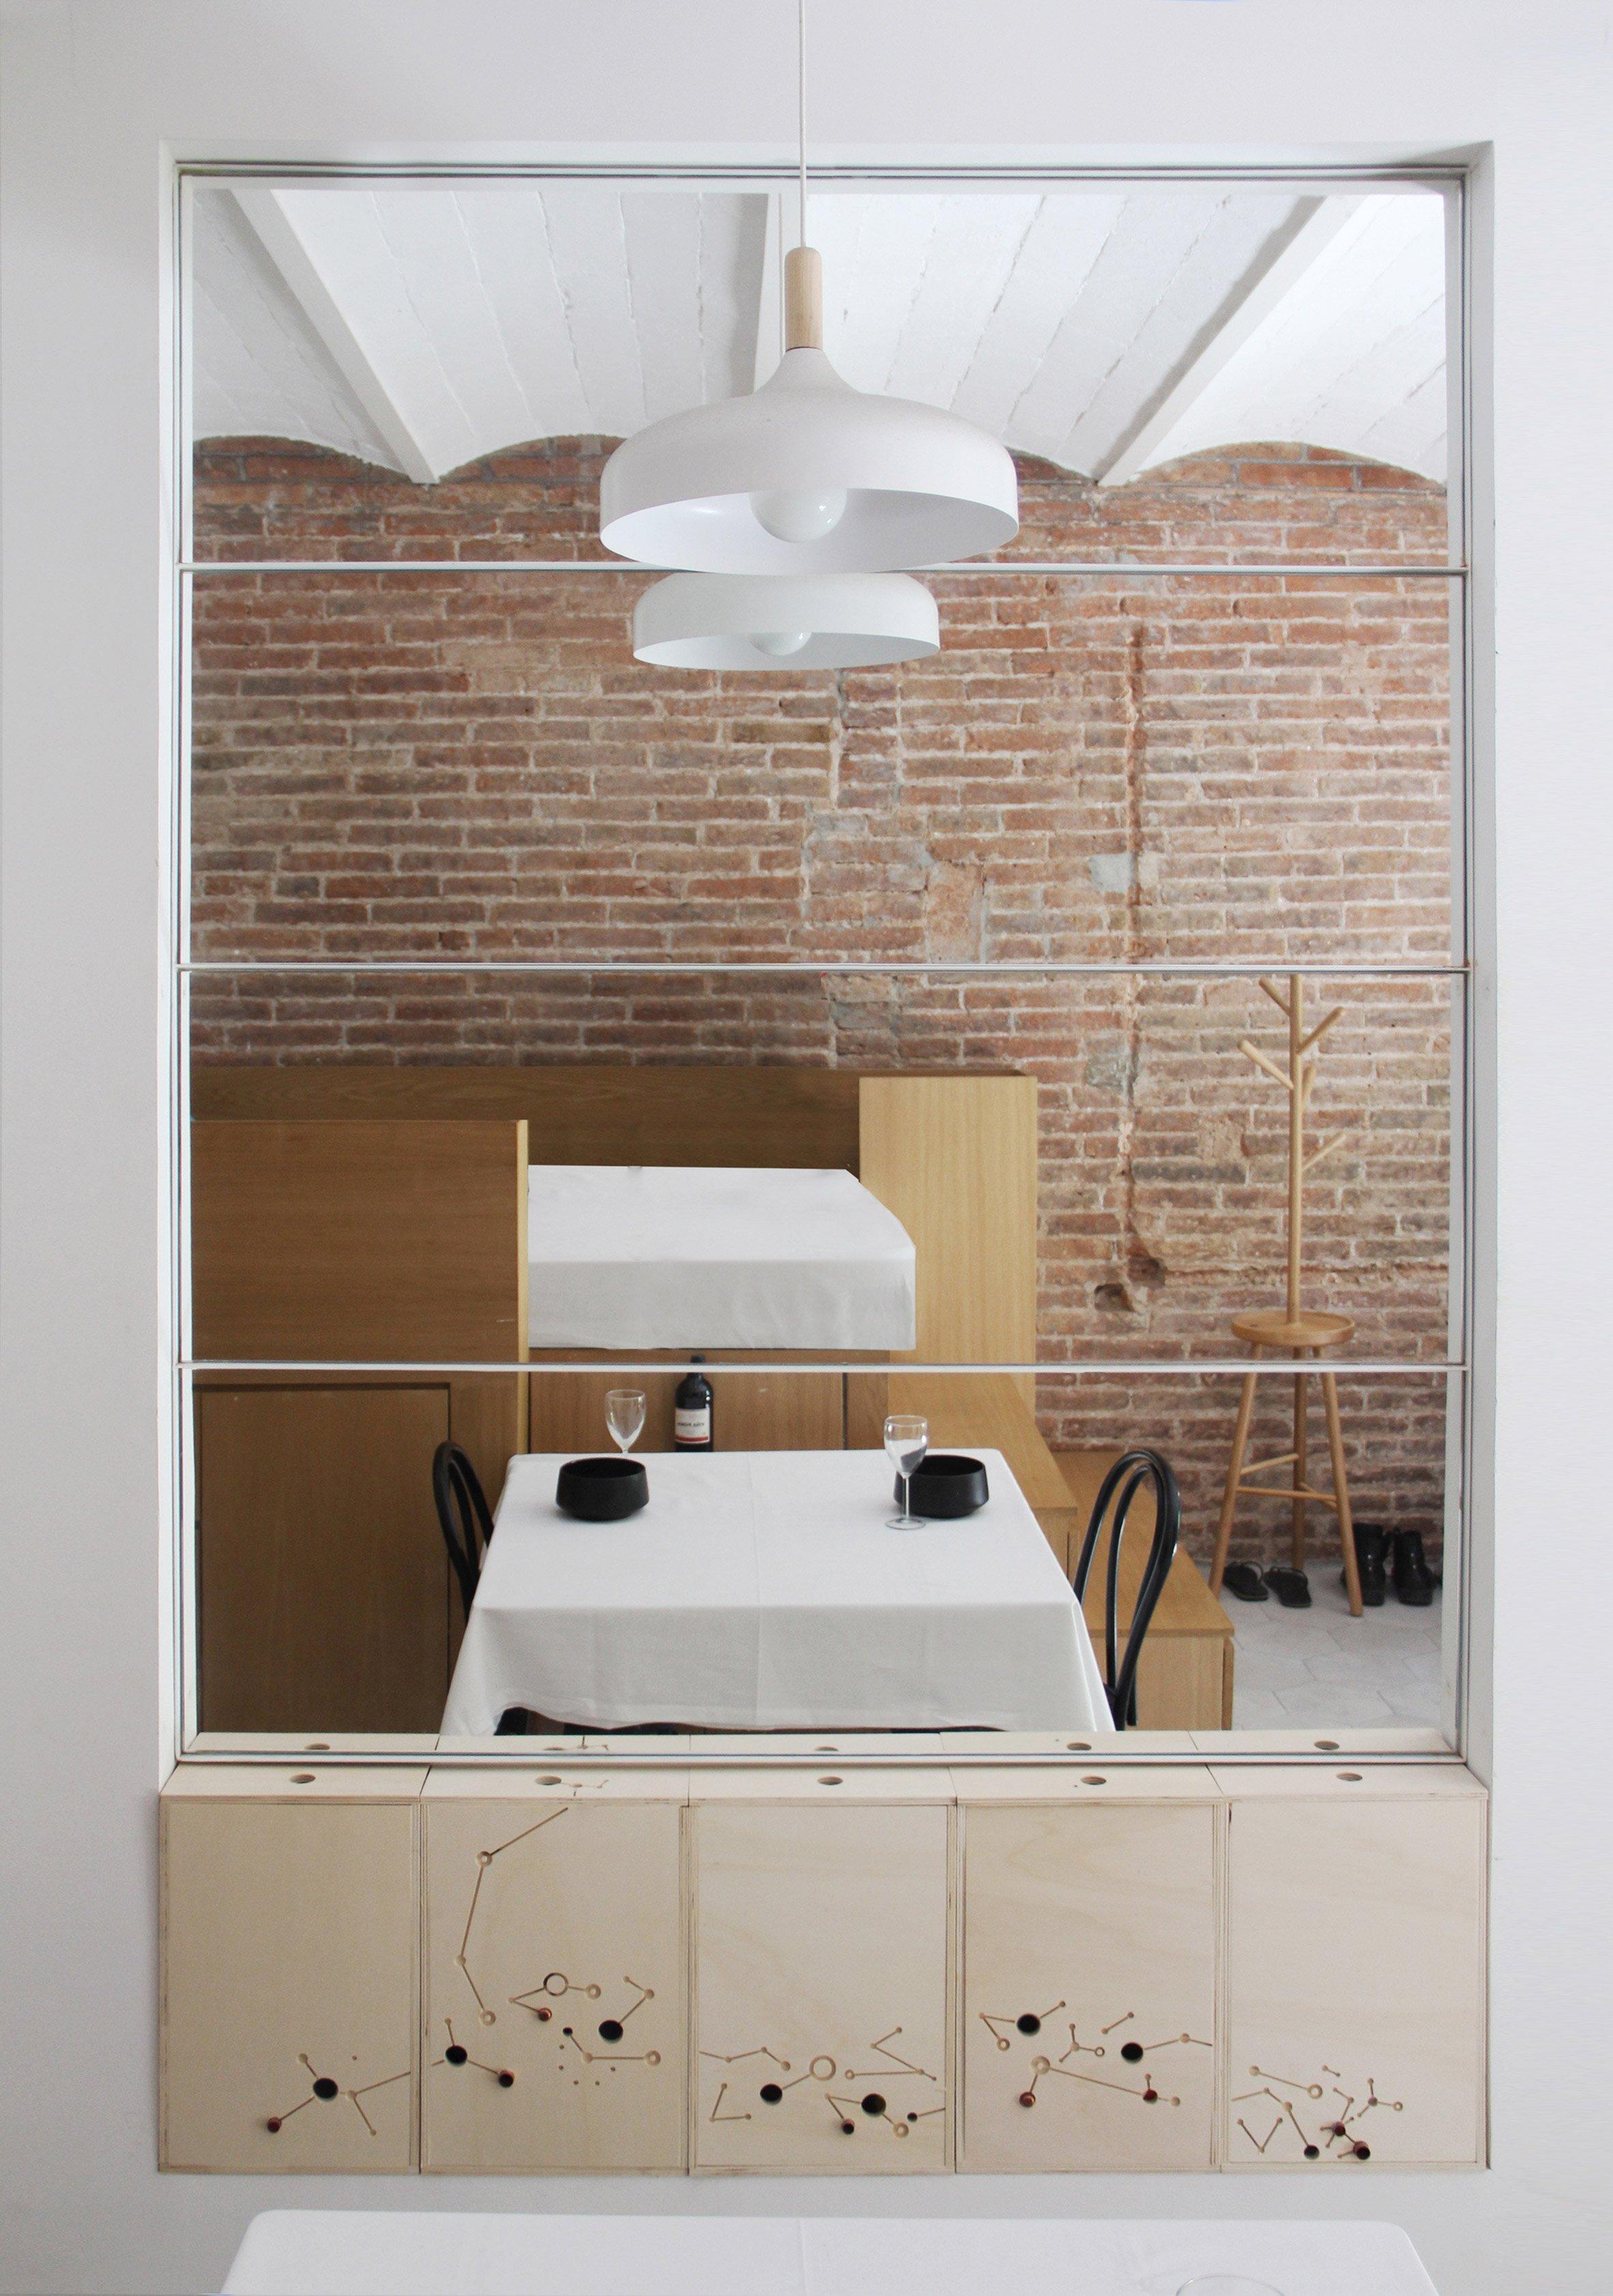 architecture-25m2-loft-interior-design-studia-osnovadesign-osnova-poltava_05